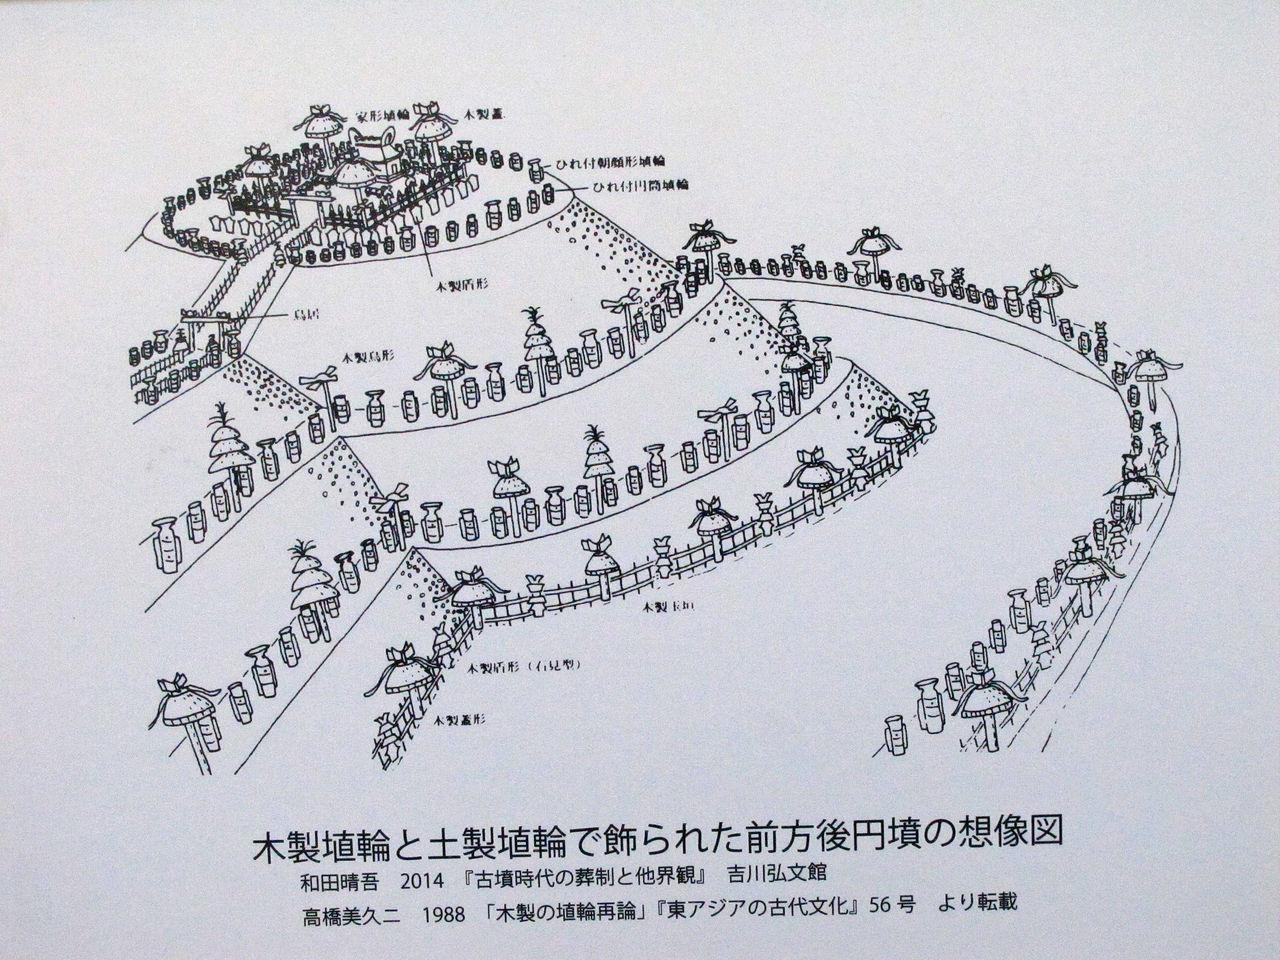 http://livedoor.blogimg.jp/minoru1936-0003/imgs/f/3/f38e8ef1.jpg